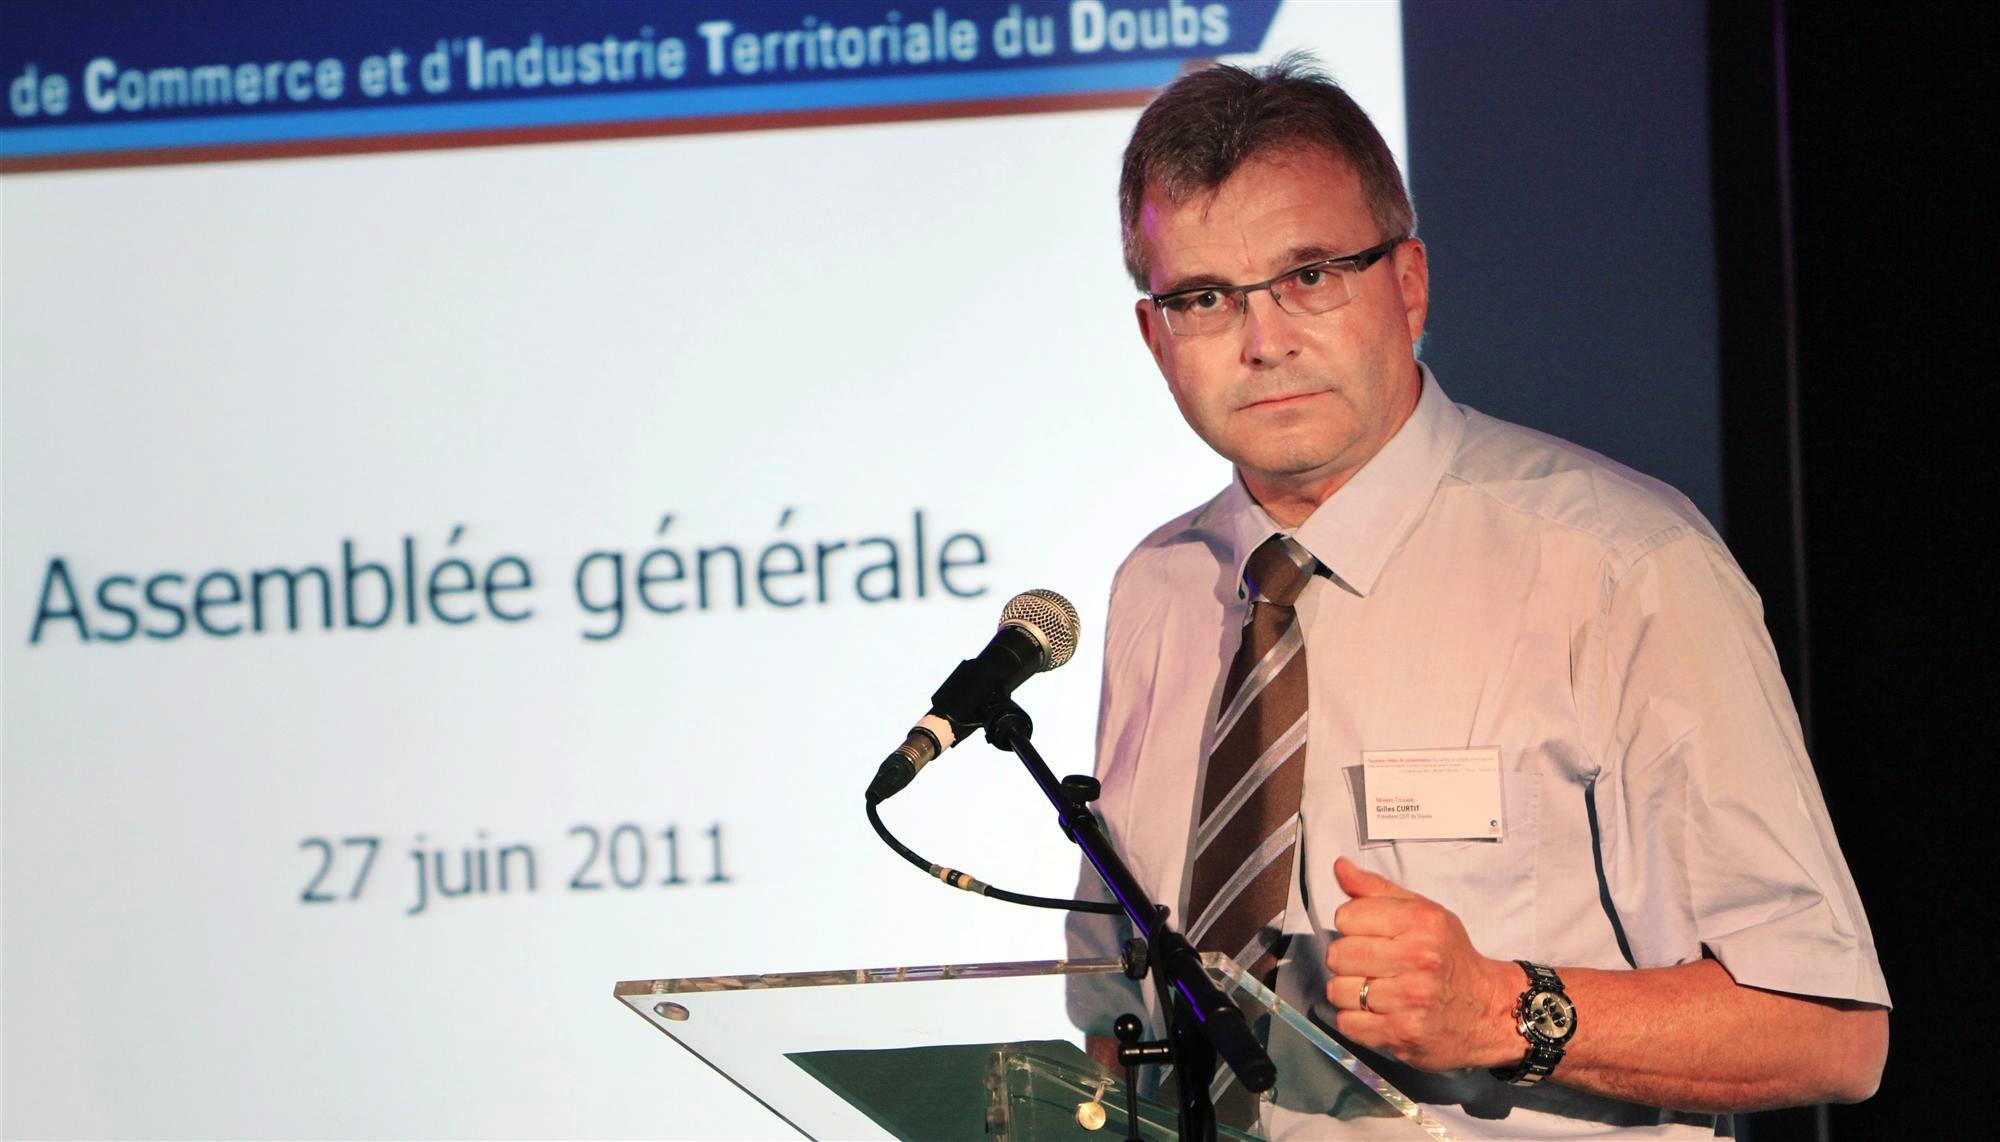 Gilles Curtit